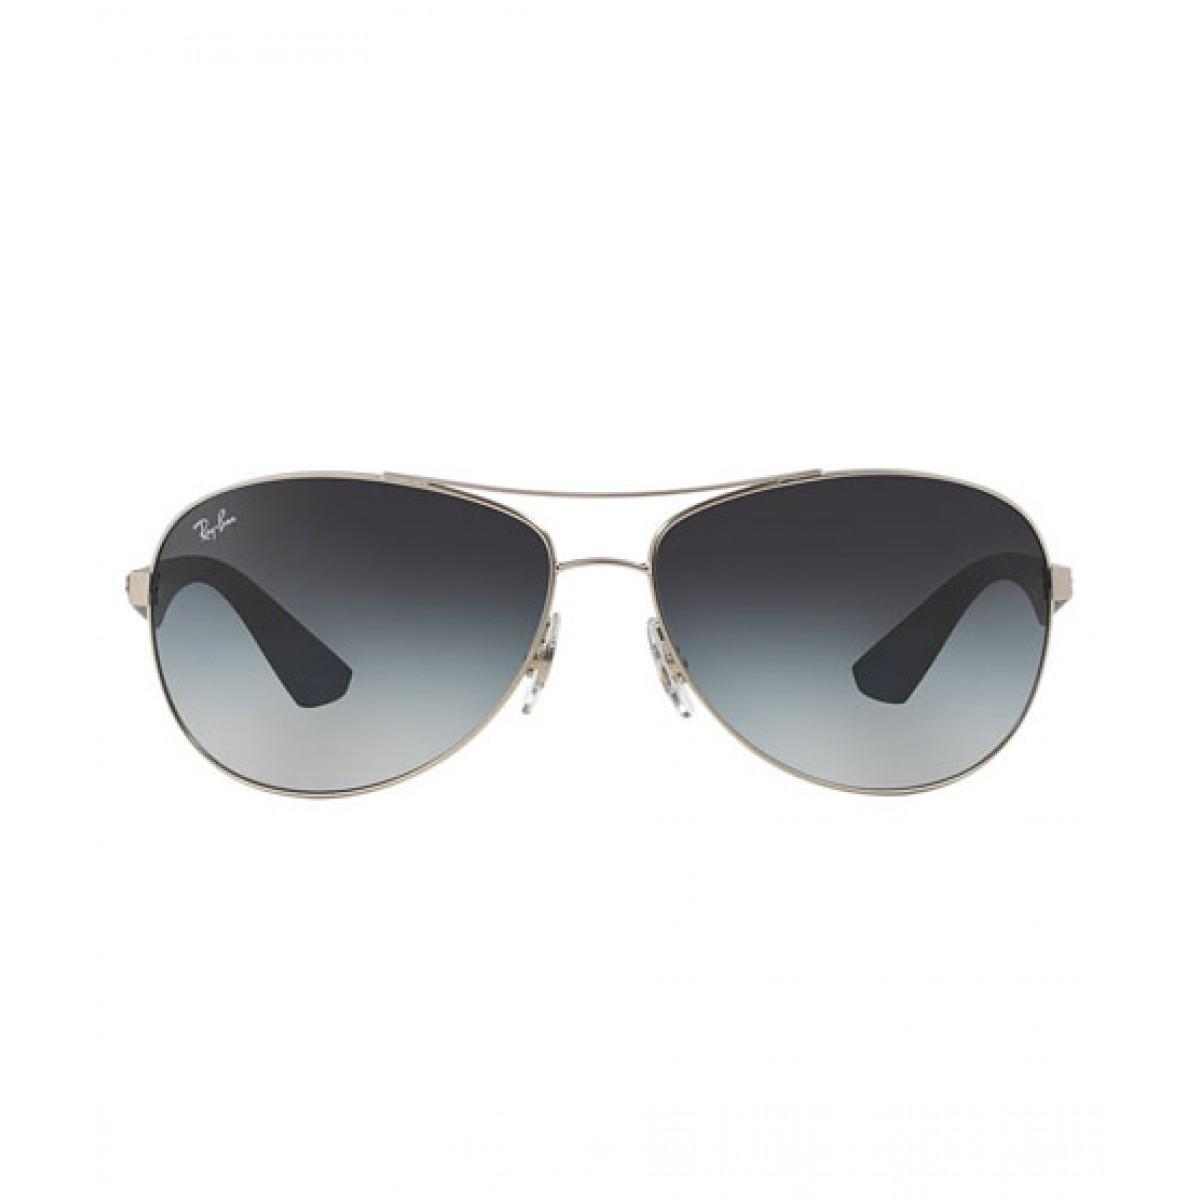 RayBan Non-Polarized Sunglasses RB3526